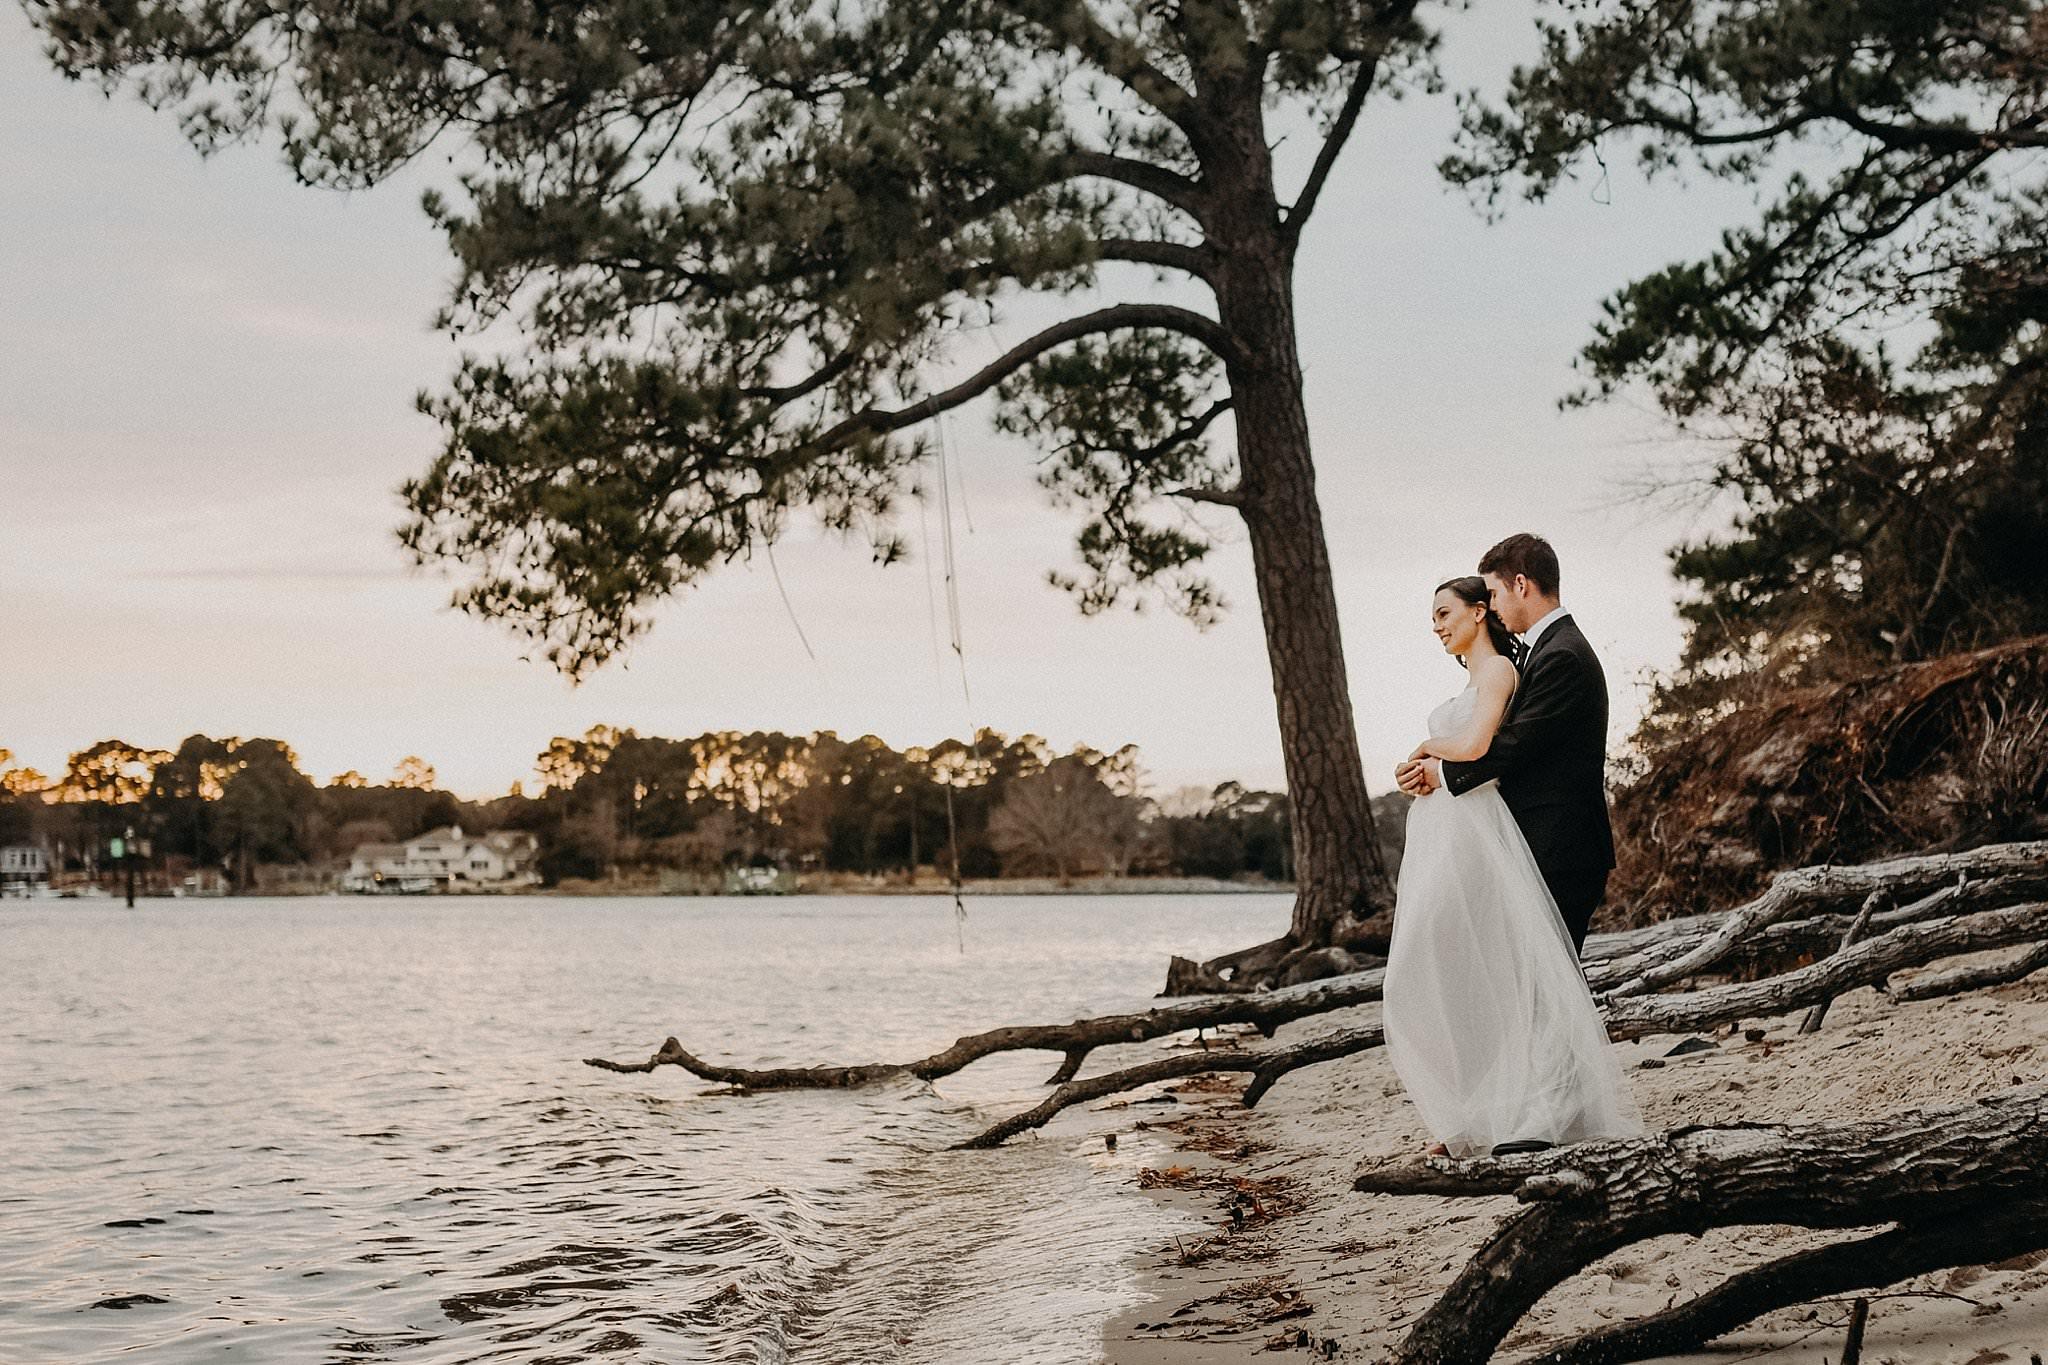 wedding-photographer-norfolk-captures-romantic-elopement-in-virginia-beach-melissa-bliss-photography.jpg